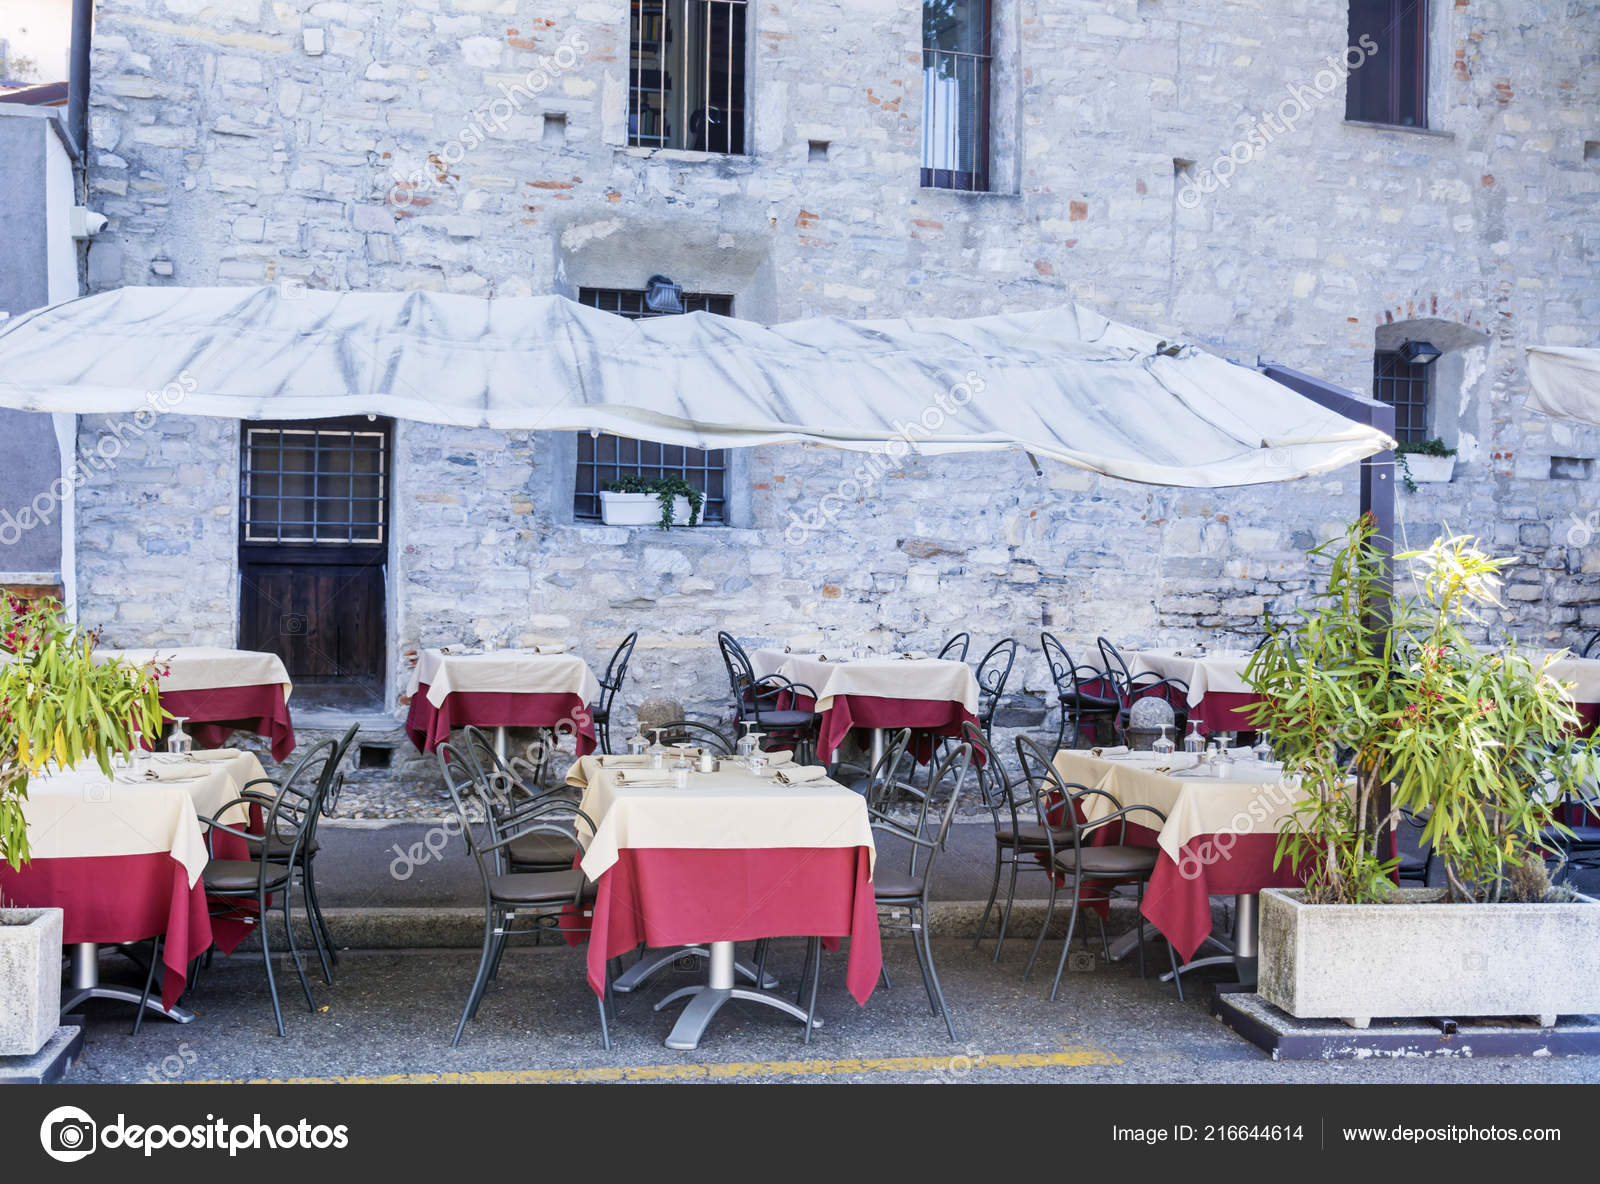 Italian Outdoor Restaurant White Umbrellas Italy Stock Photo C Brnmanzurova Gmail Com 216644614